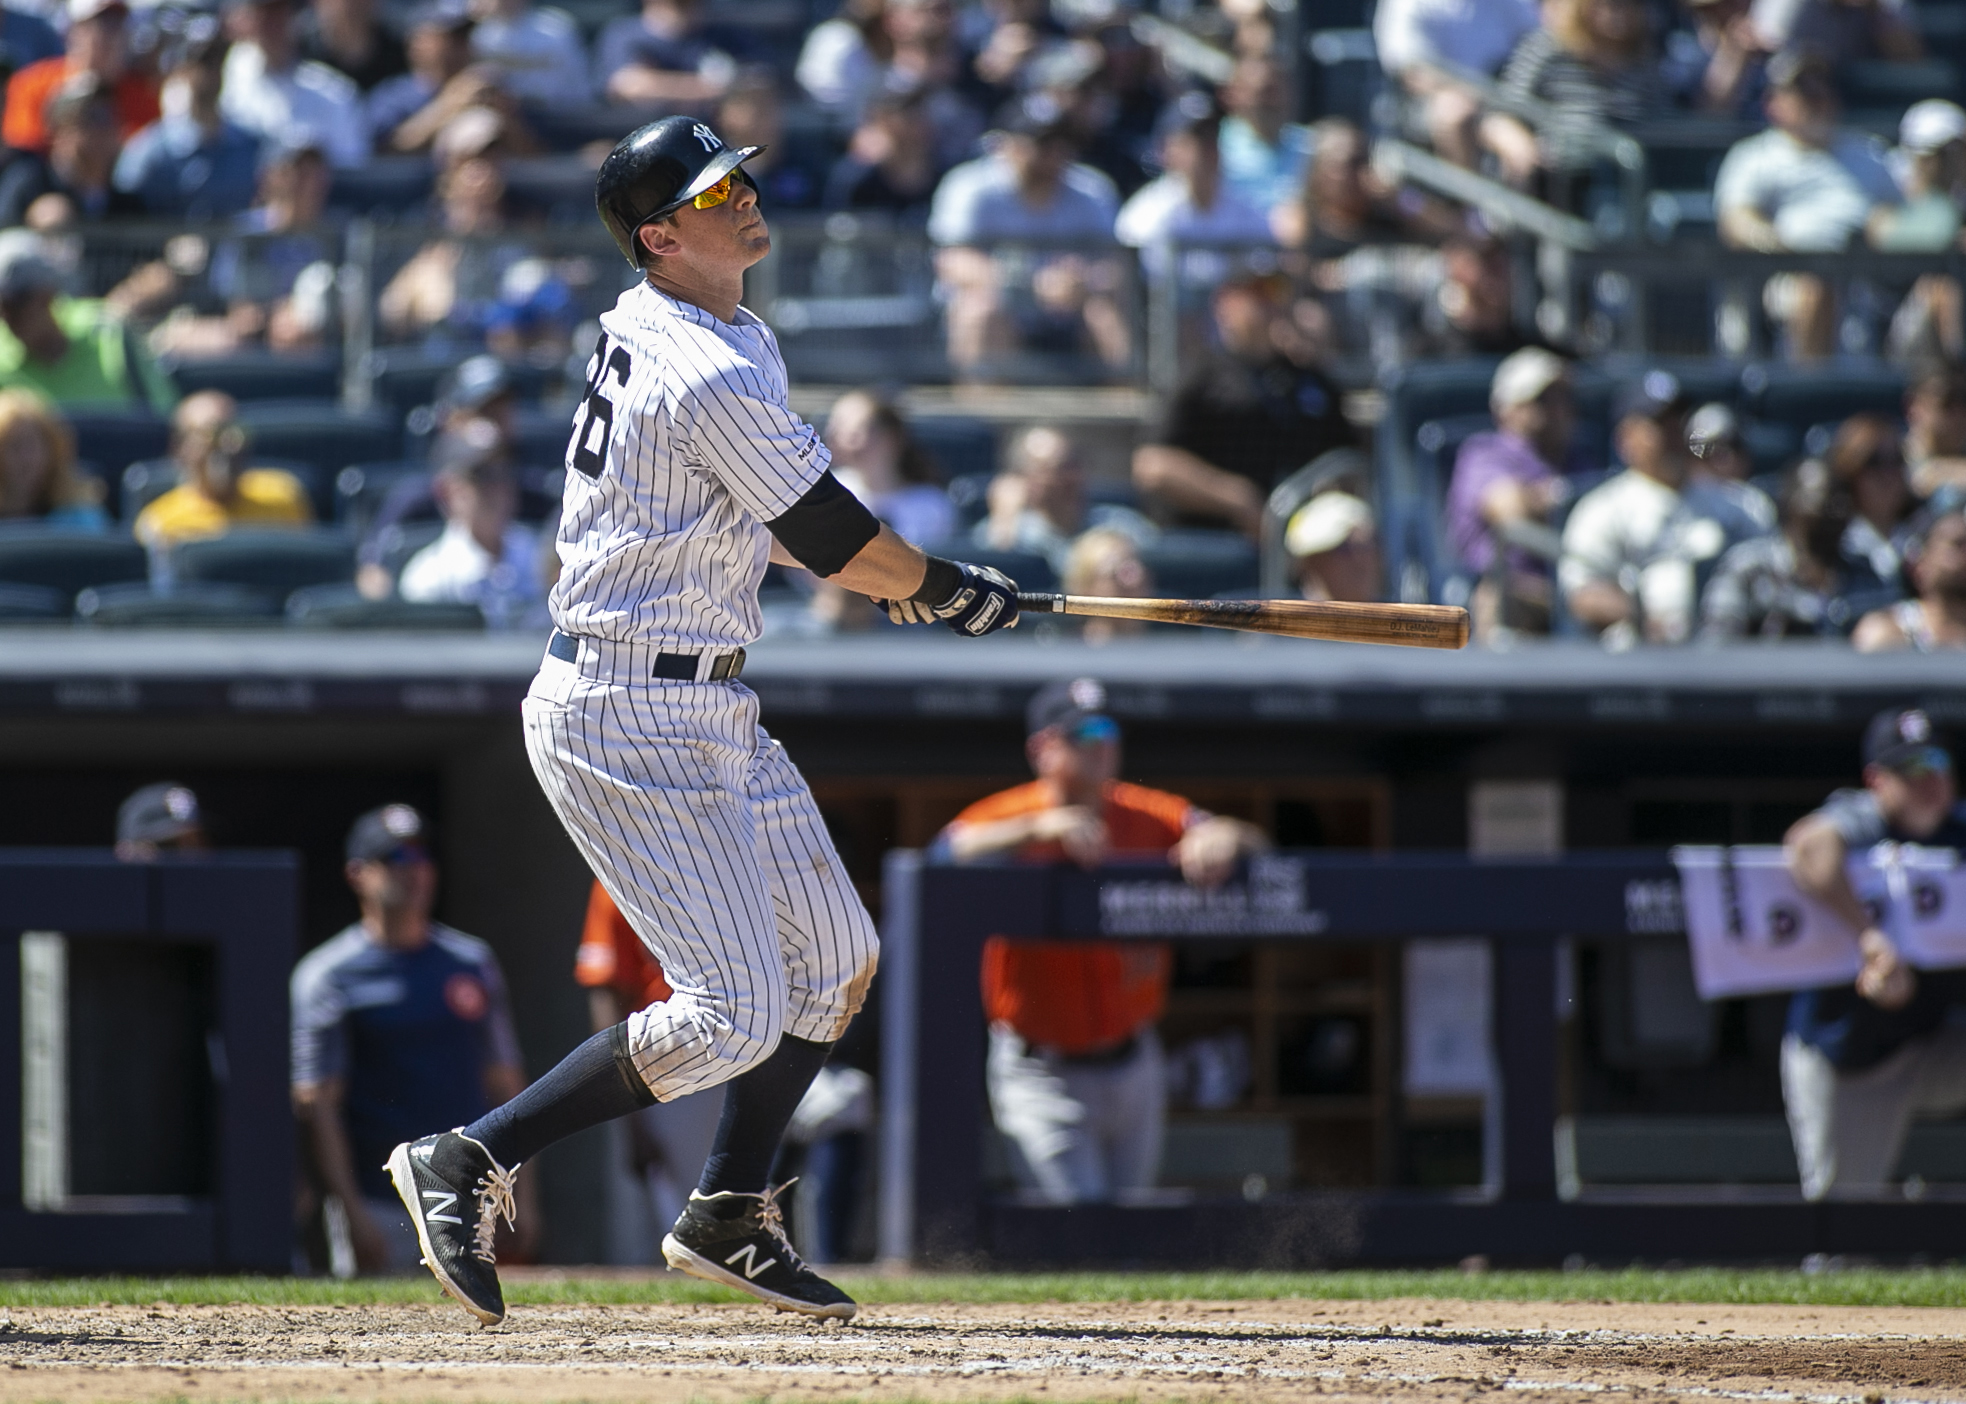 MLB: Houston Astros at New York Yankees